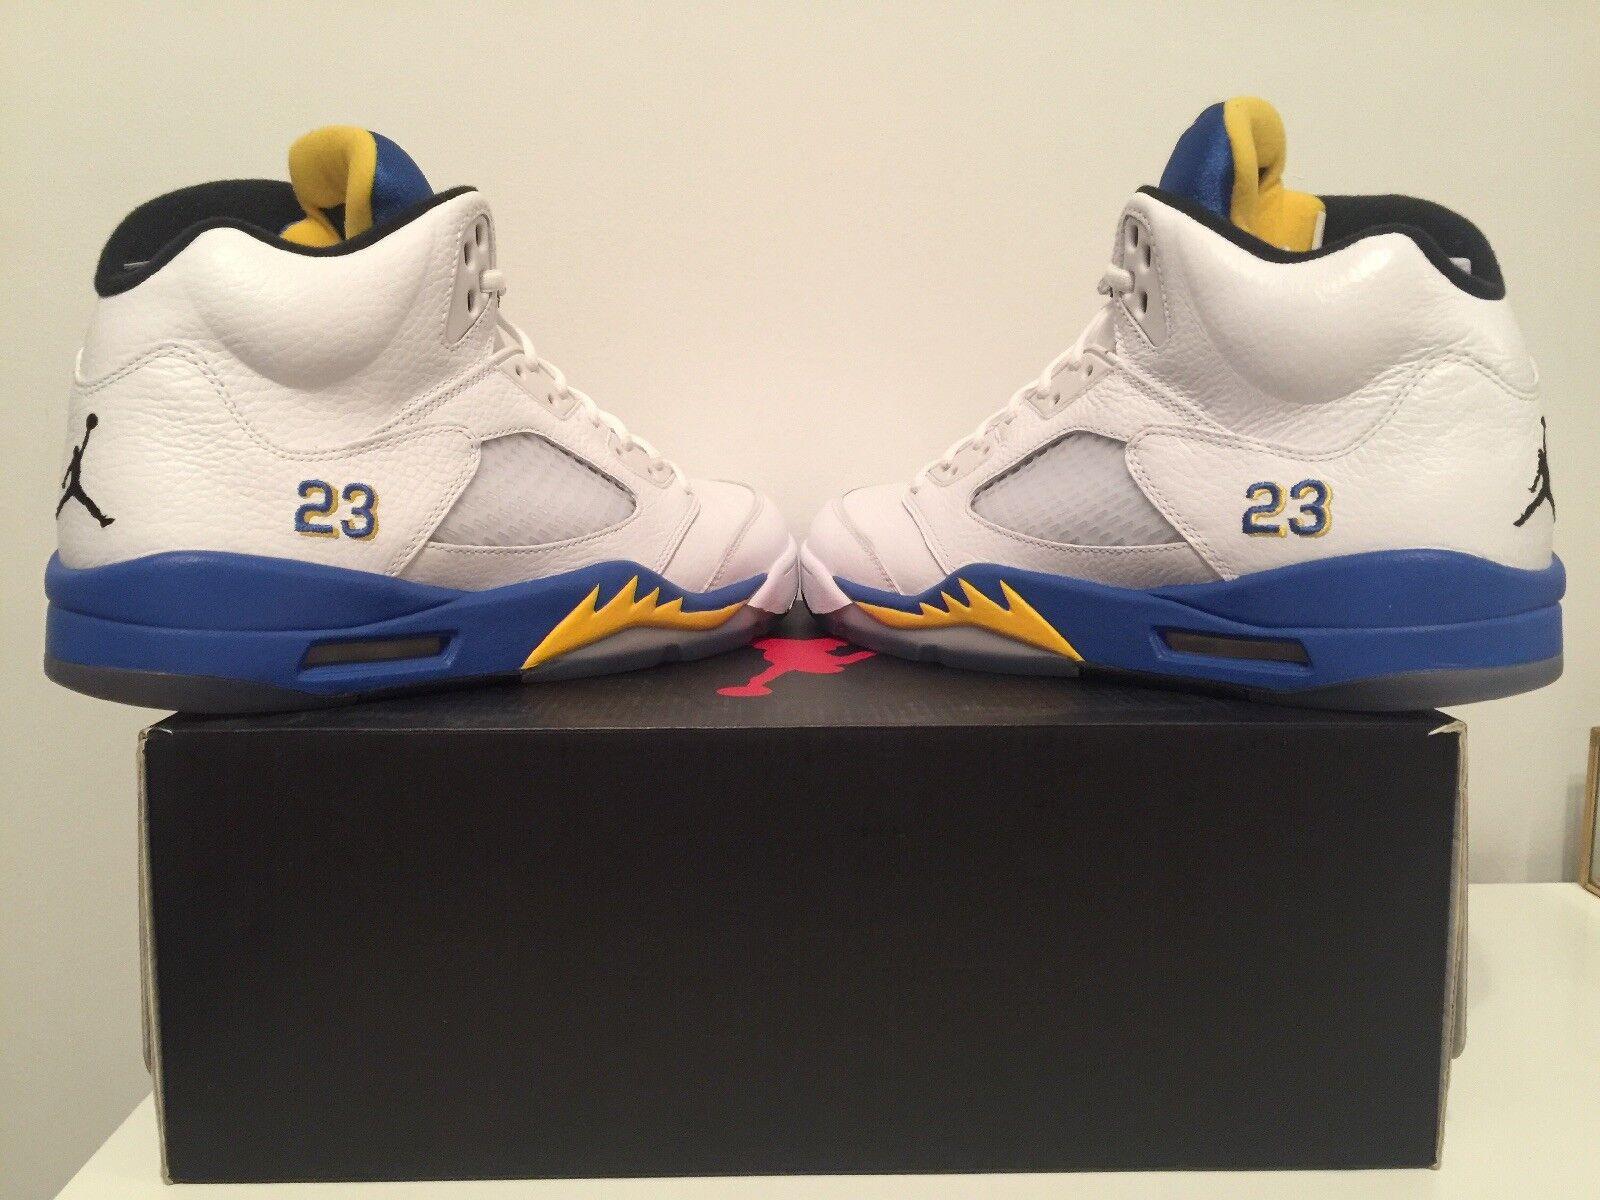 Nike Air Jordan V 5 Retro LANEY BUCS WHITE ROYAL blueE MAIZE BLACK 136027-189 10